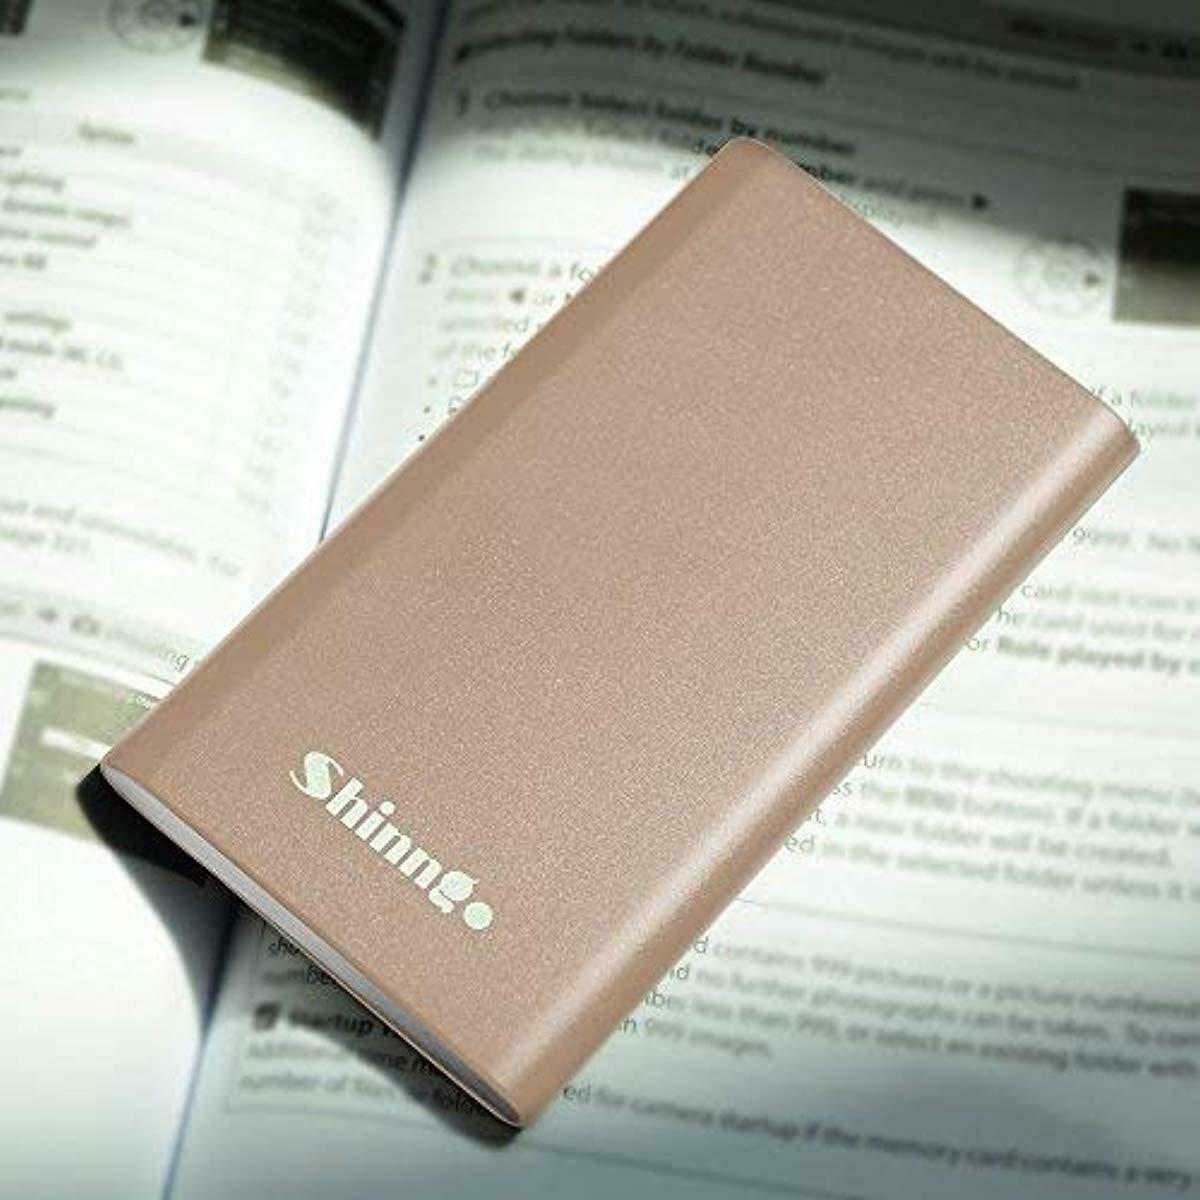 Shinngo Portable Charger 4000mAh Battery Ultra Slim Power Bank Aviation Aluminum